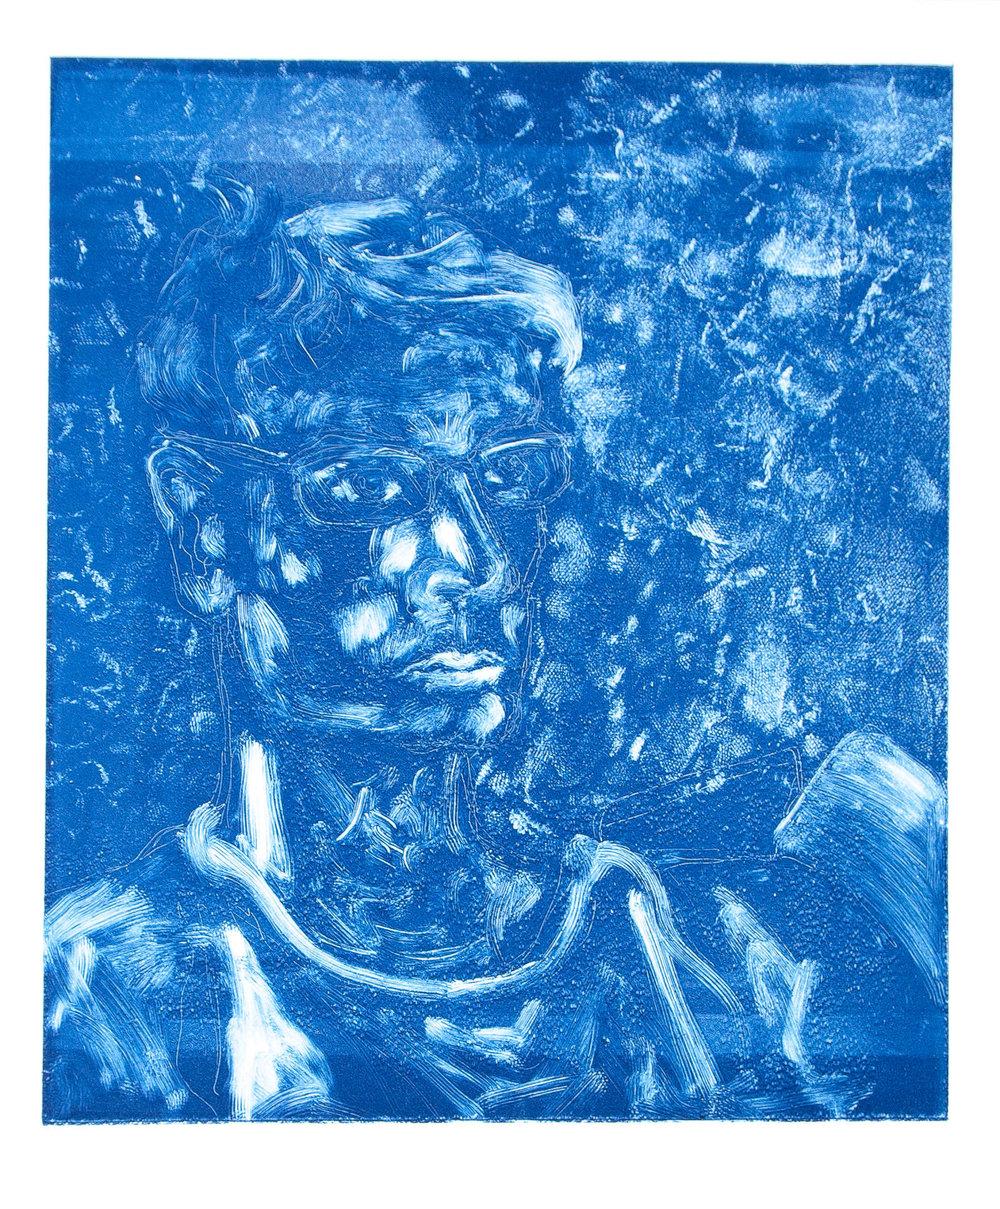 Blue-Boy--Monoprint--35x29.5cm_1600_c.jpg